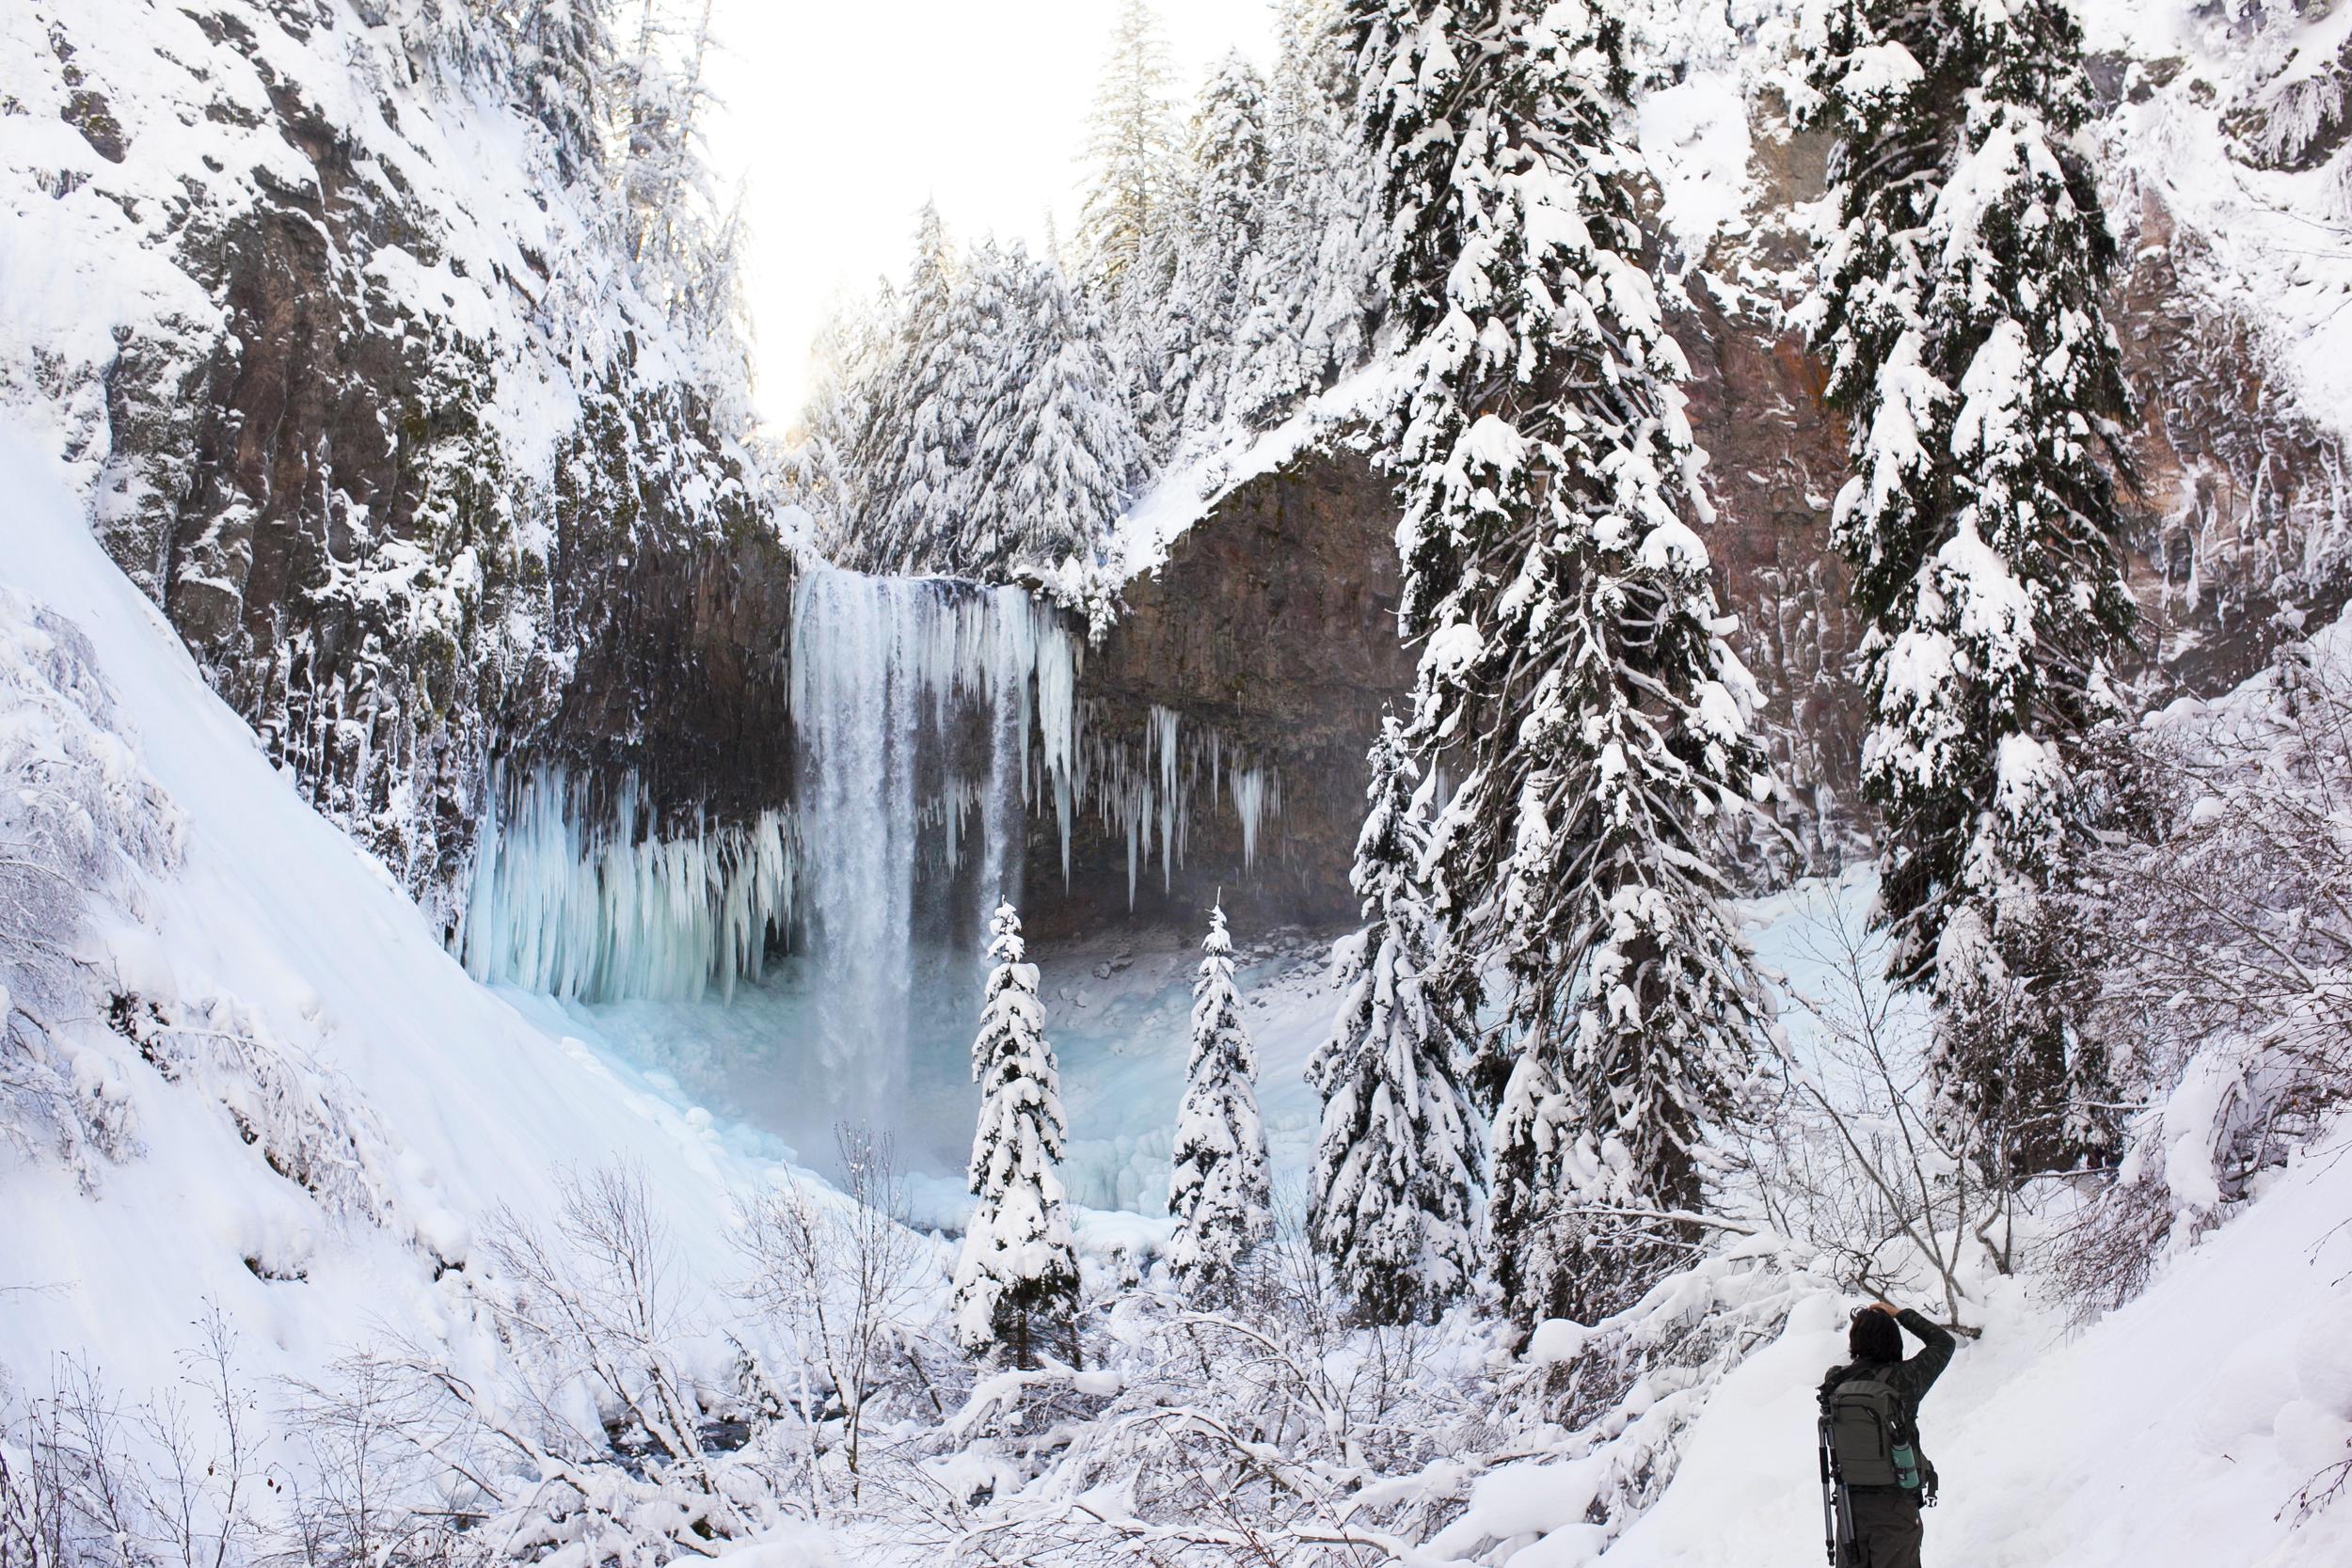 Derek Gaumer photographing the beautiful frozen Tamanawas Falls